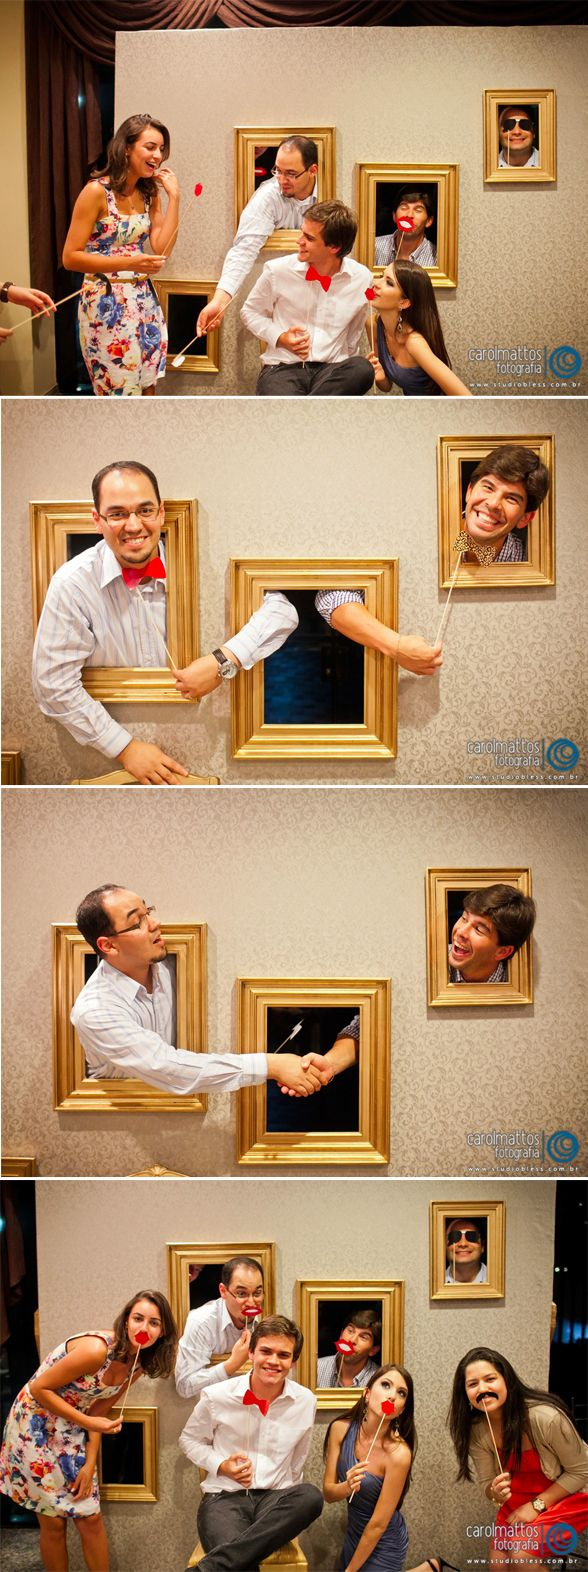 Entretenimiento para los invitados de tu boda. Precioso photocall para tu gran día. #wedding#boda #photocall